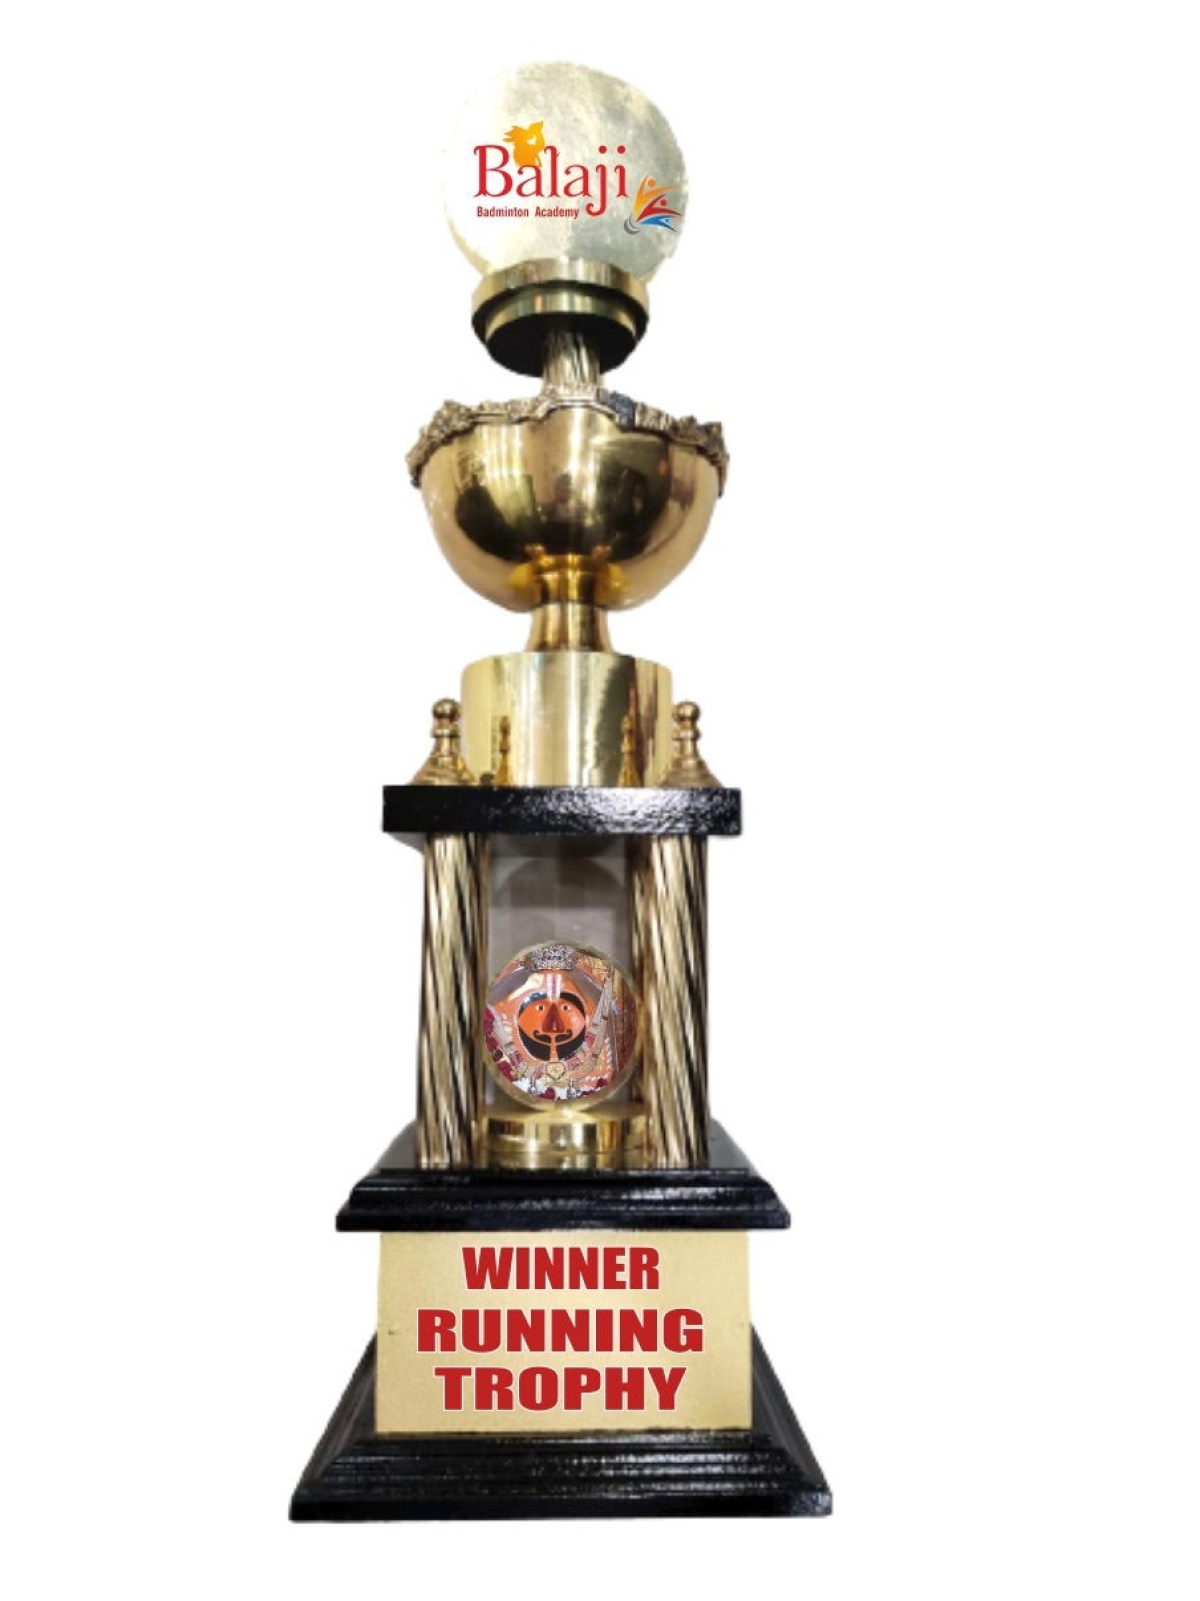 Balaji Cup badminton trophy